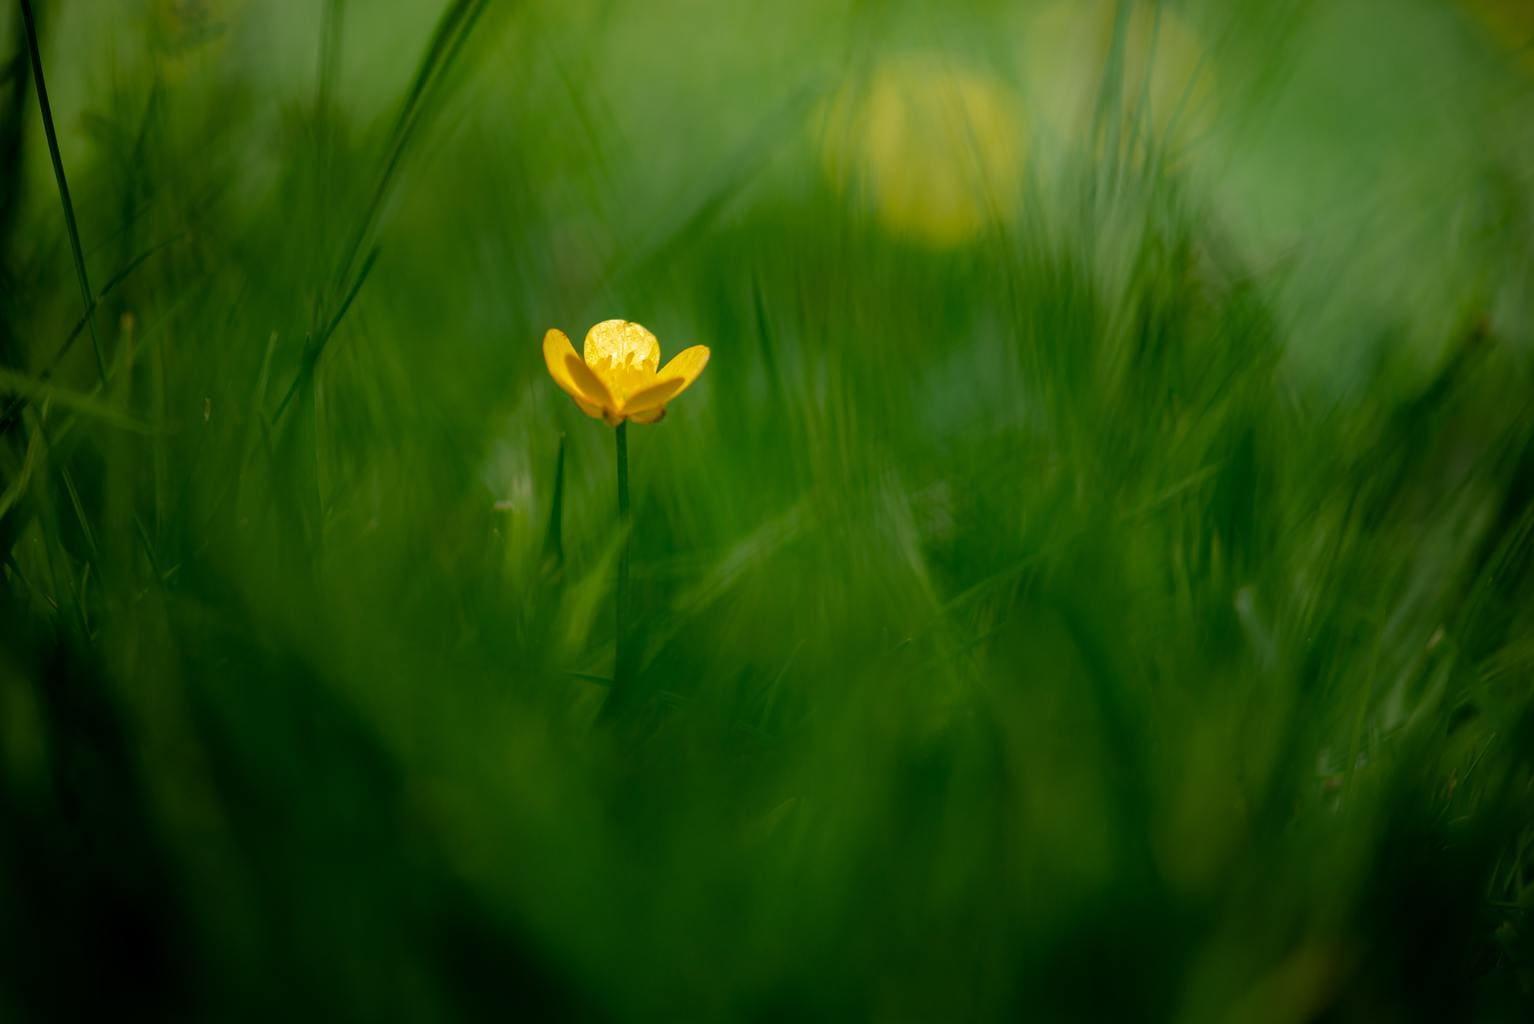 primavera flor aislada